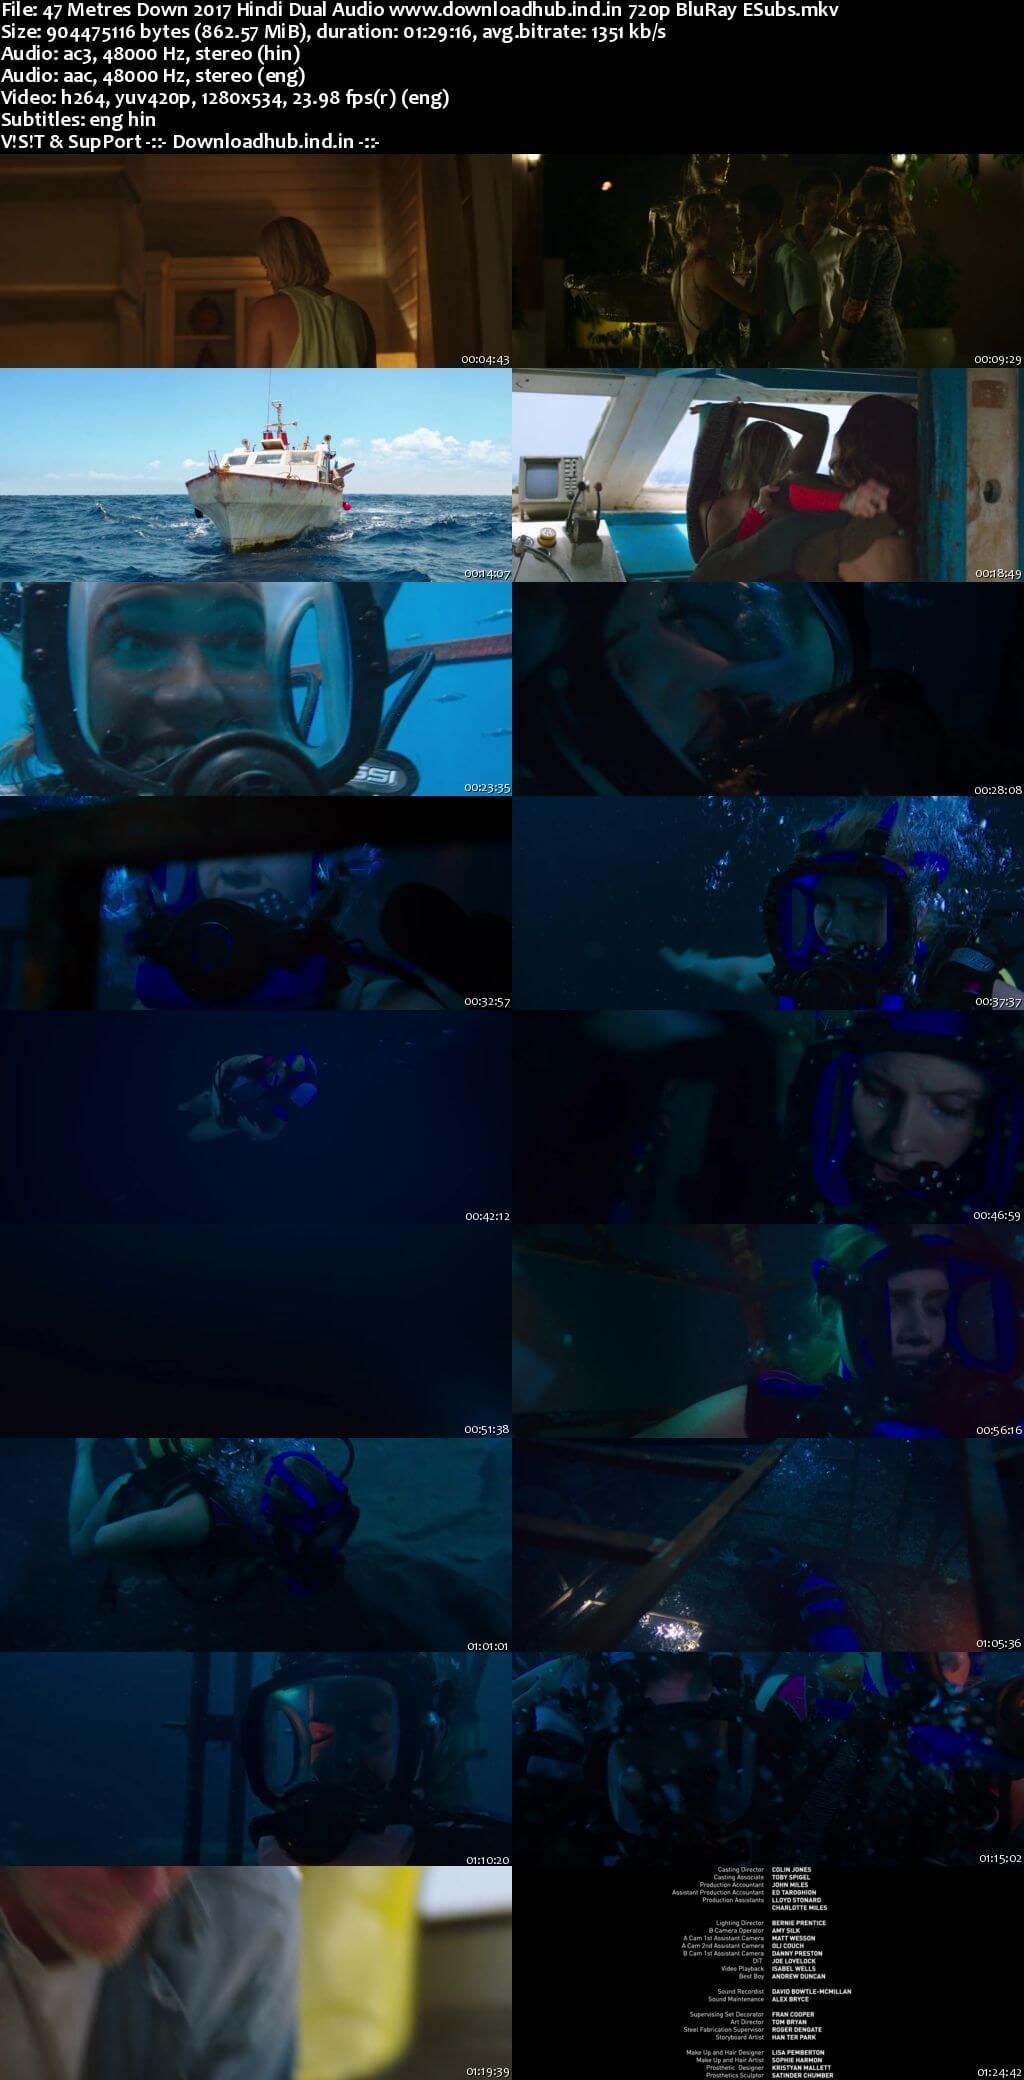 47 Metres Down 2017 Hindi Dual Audio 720p BluRay ESubs